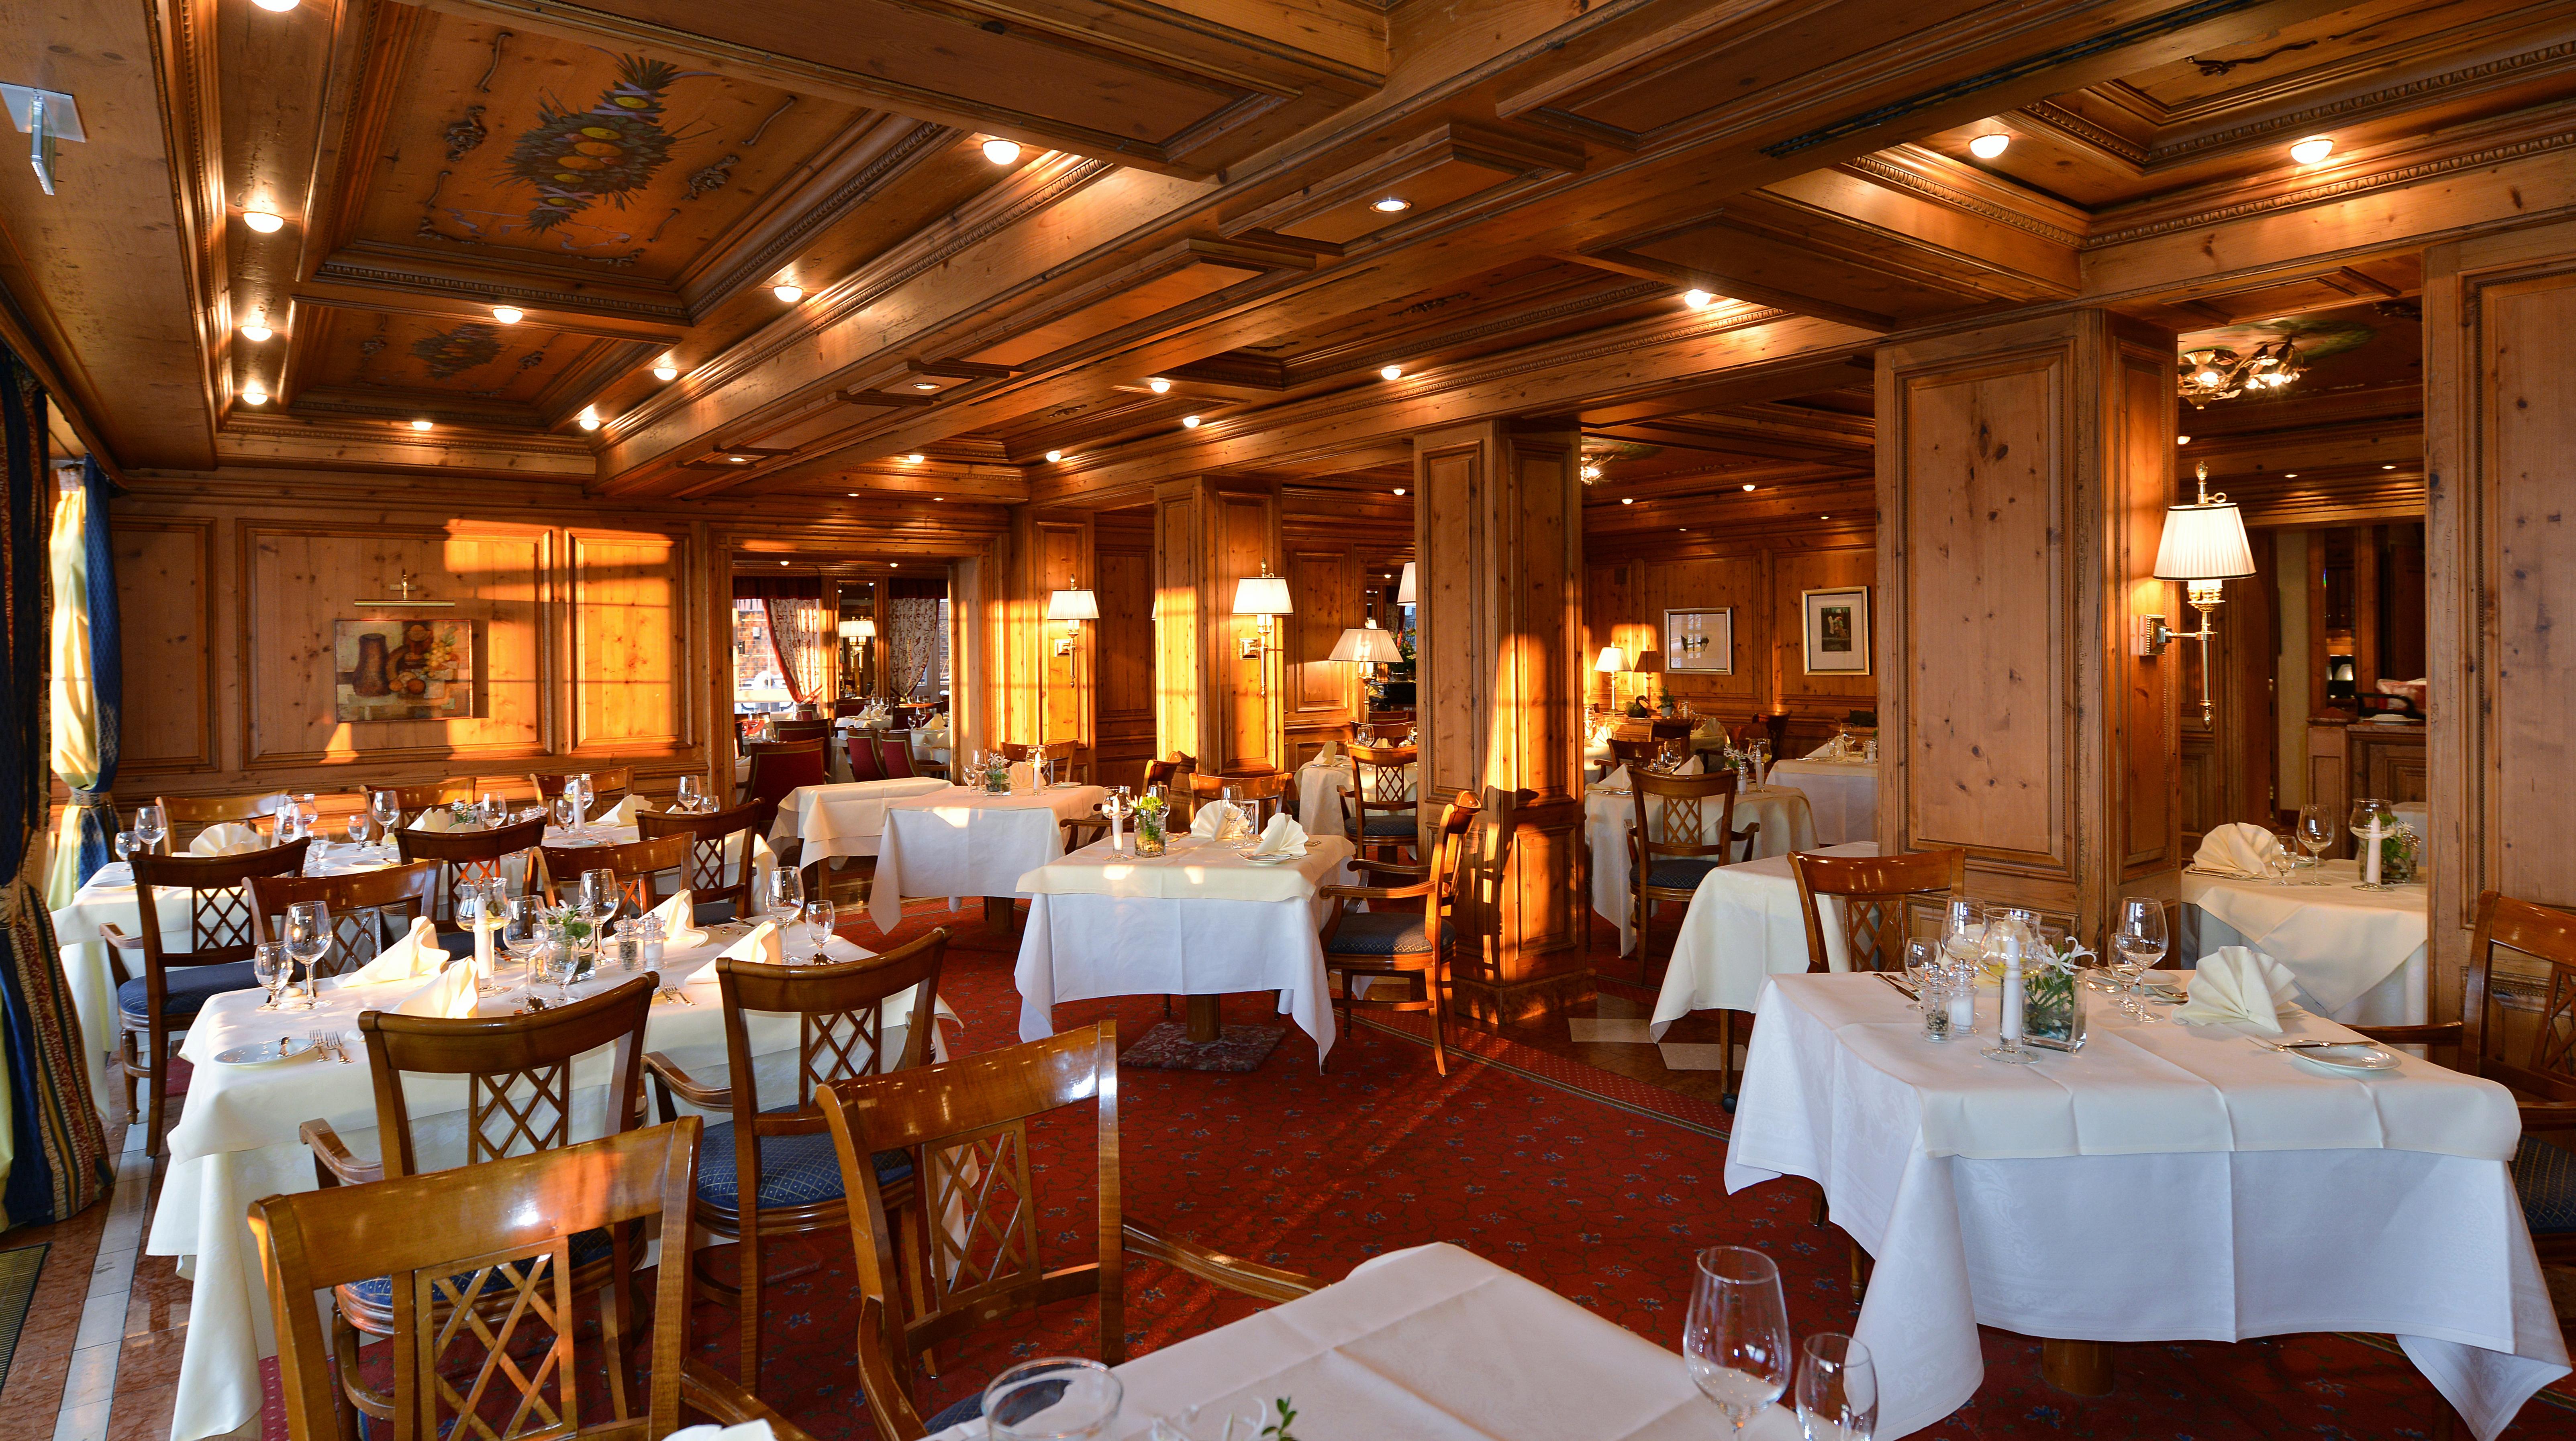 Hotel Therme Bad Teinach Hochzeitslocation In Bad Teinach